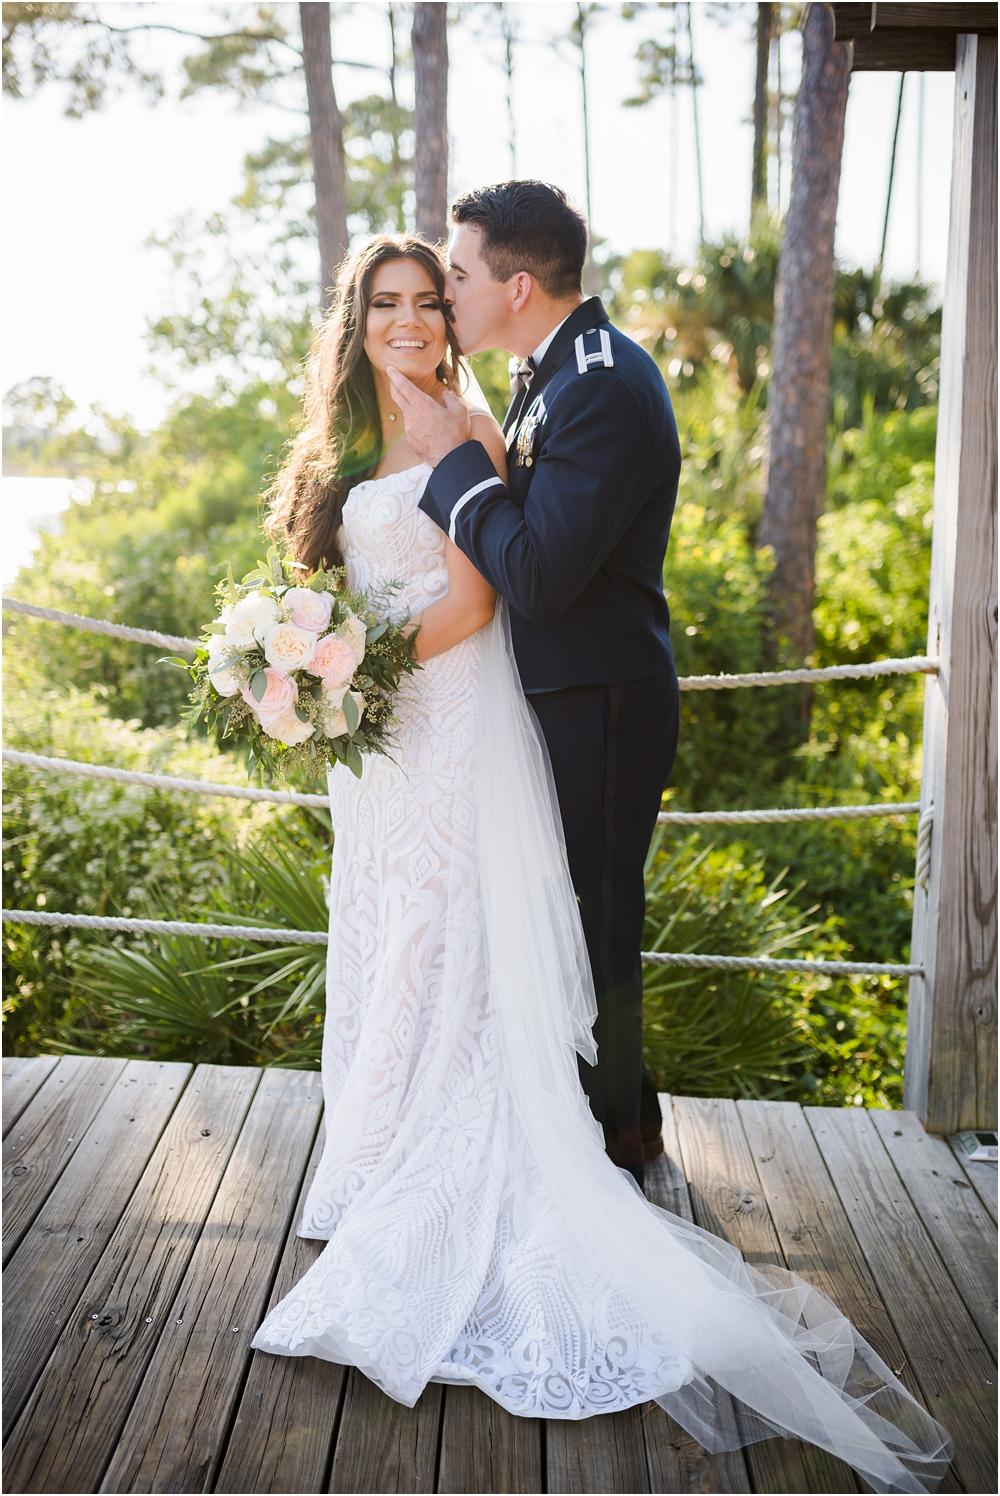 amack-wedding-kiersten-stevenson-photography-30a-panama-city-beach-dothan-tallahassee-(238-of-882).JPG